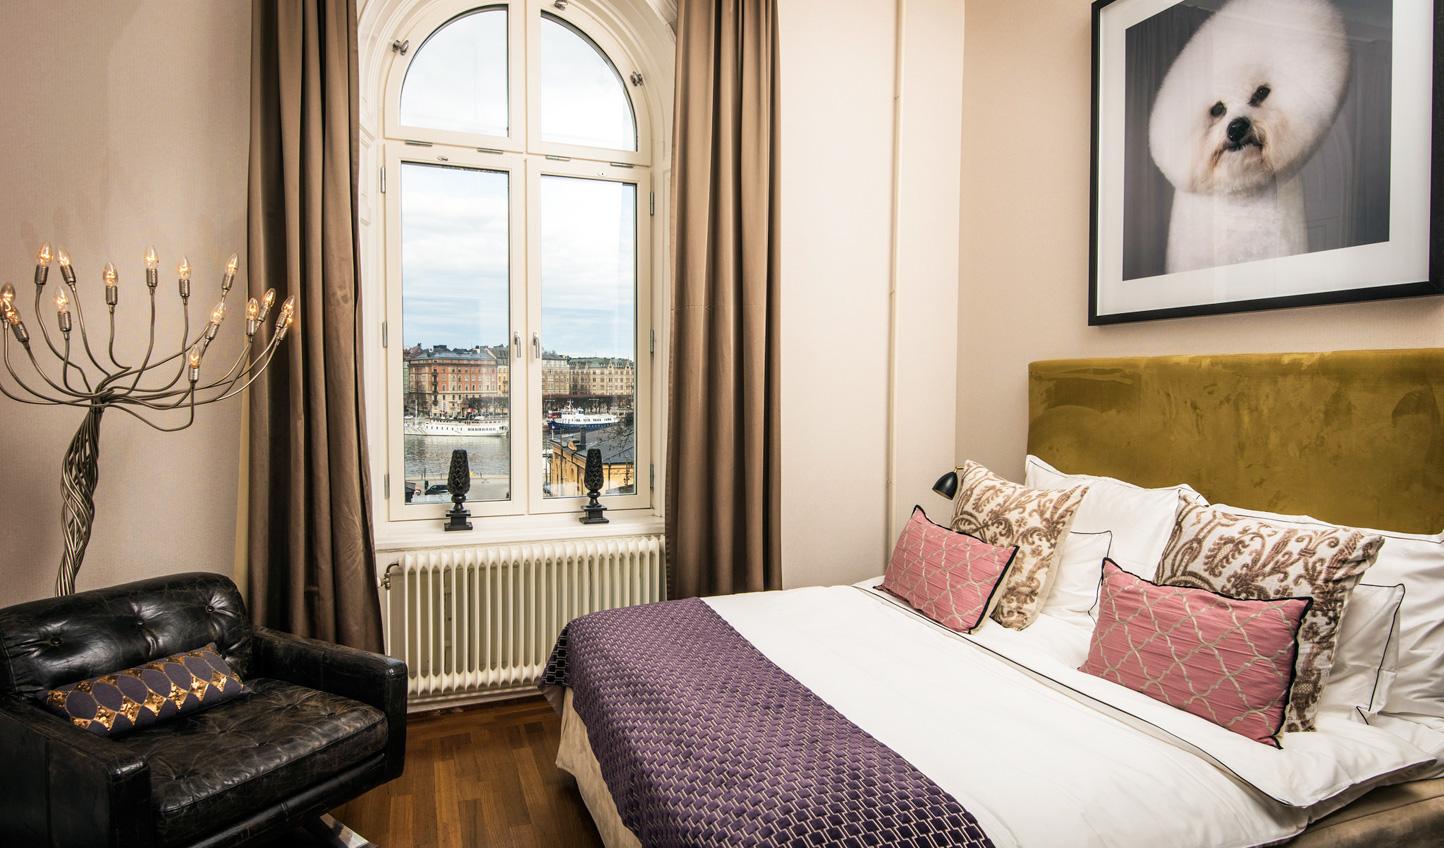 Stay in the stylish Lydmar Hotel